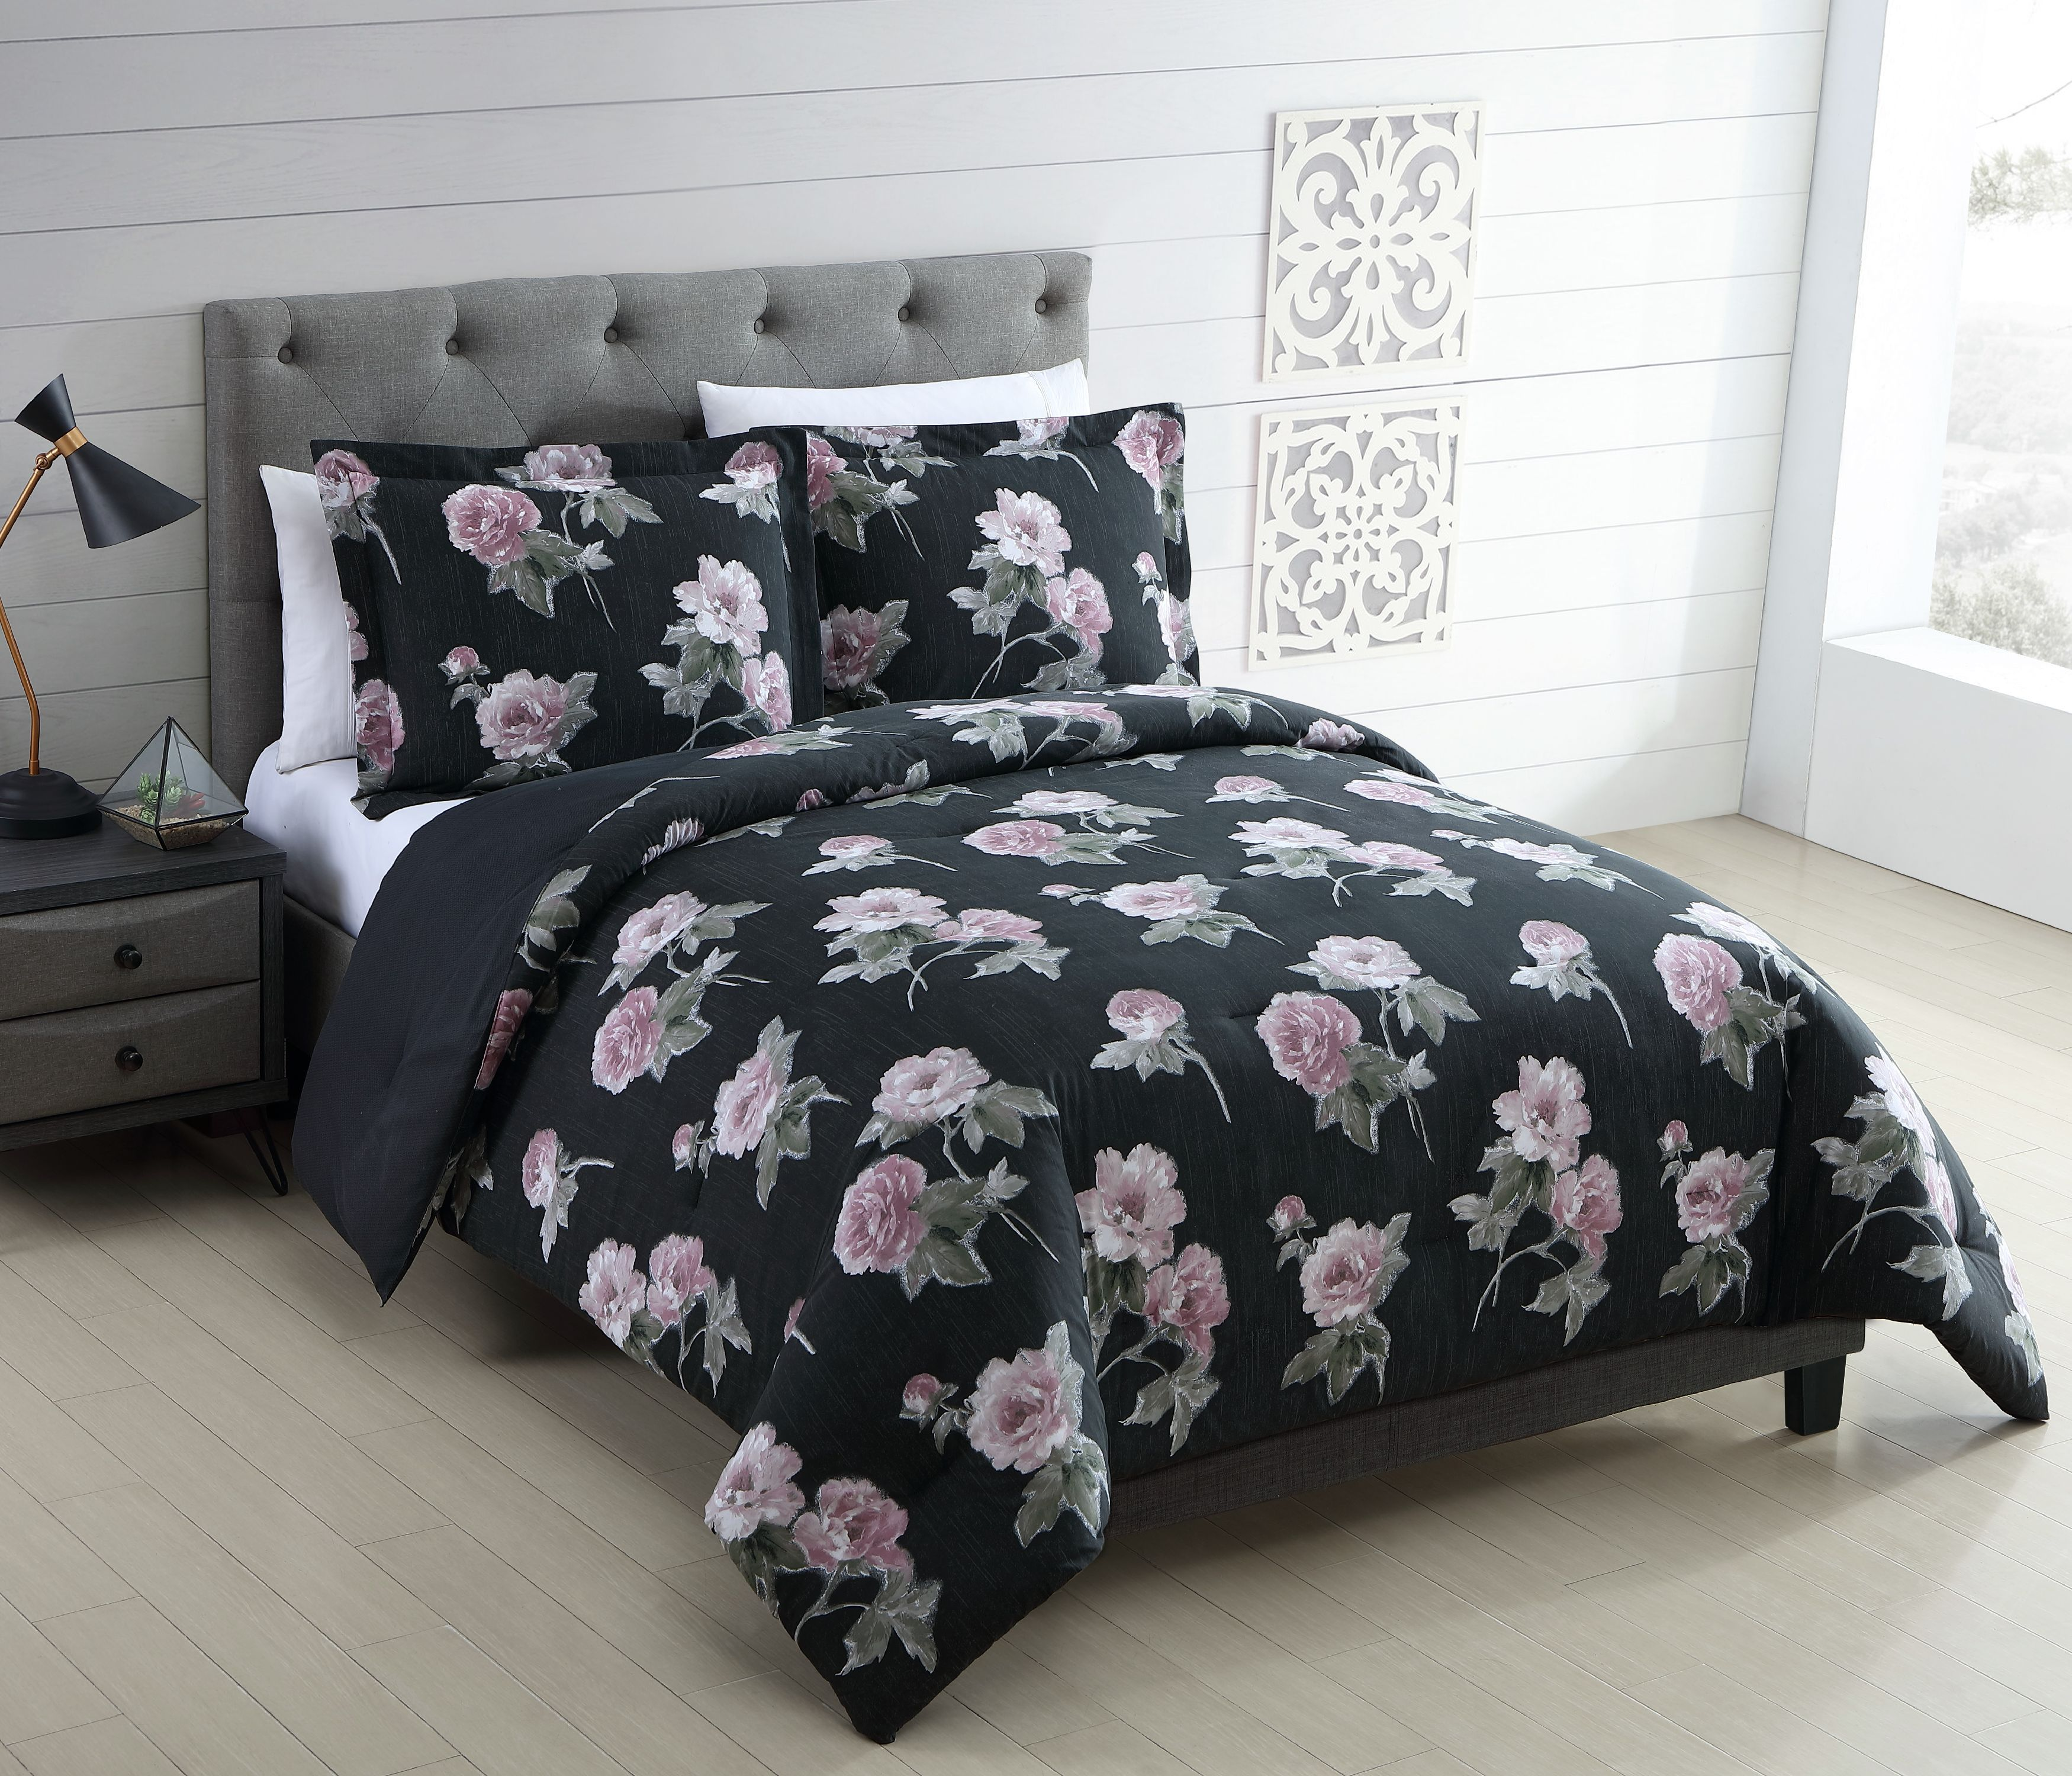 bf3cbd043bc8f7422b56533e015168a0 - Better Homes And Gardens 11 Piece Comforter Set